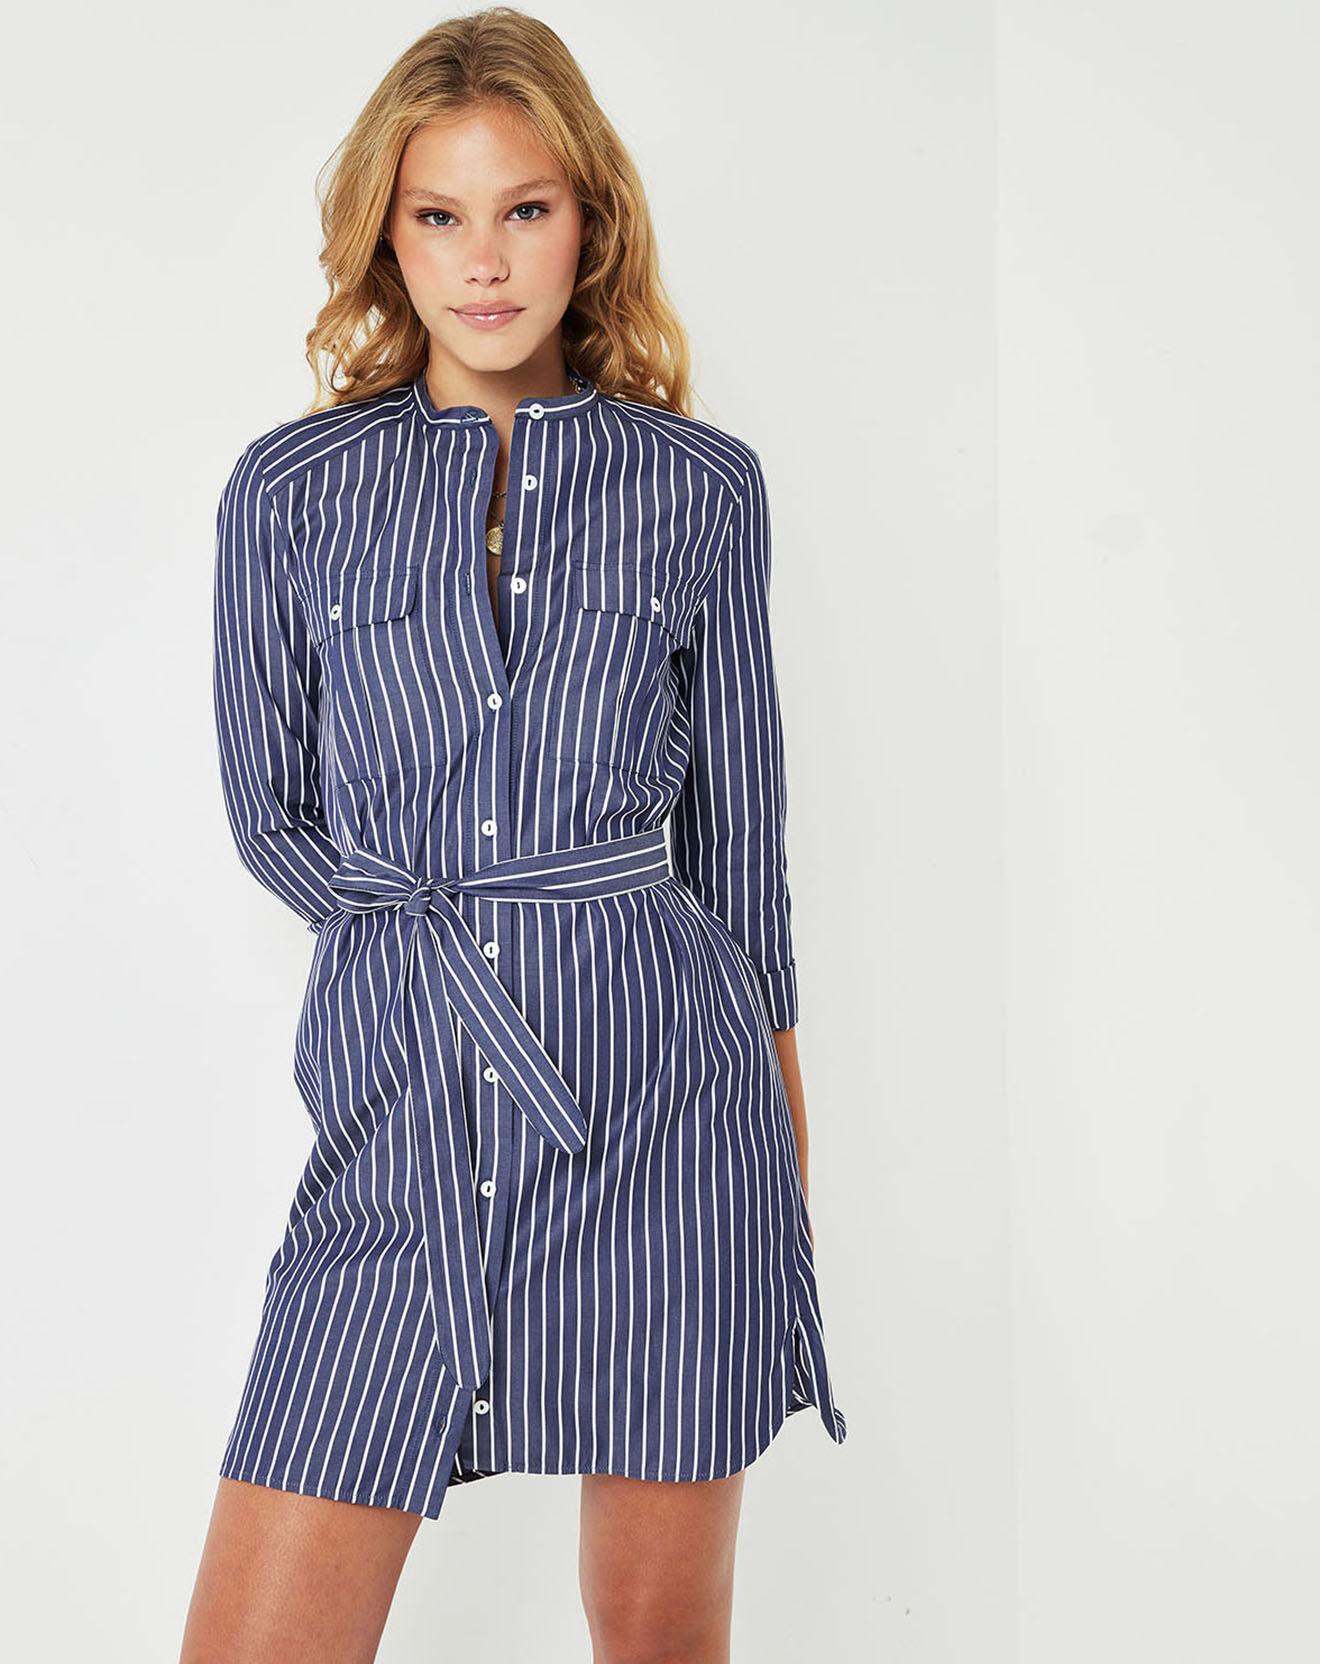 Robe Ginette à rayures bleu marine/blanc - Cuisse de Grenouille - Modalova